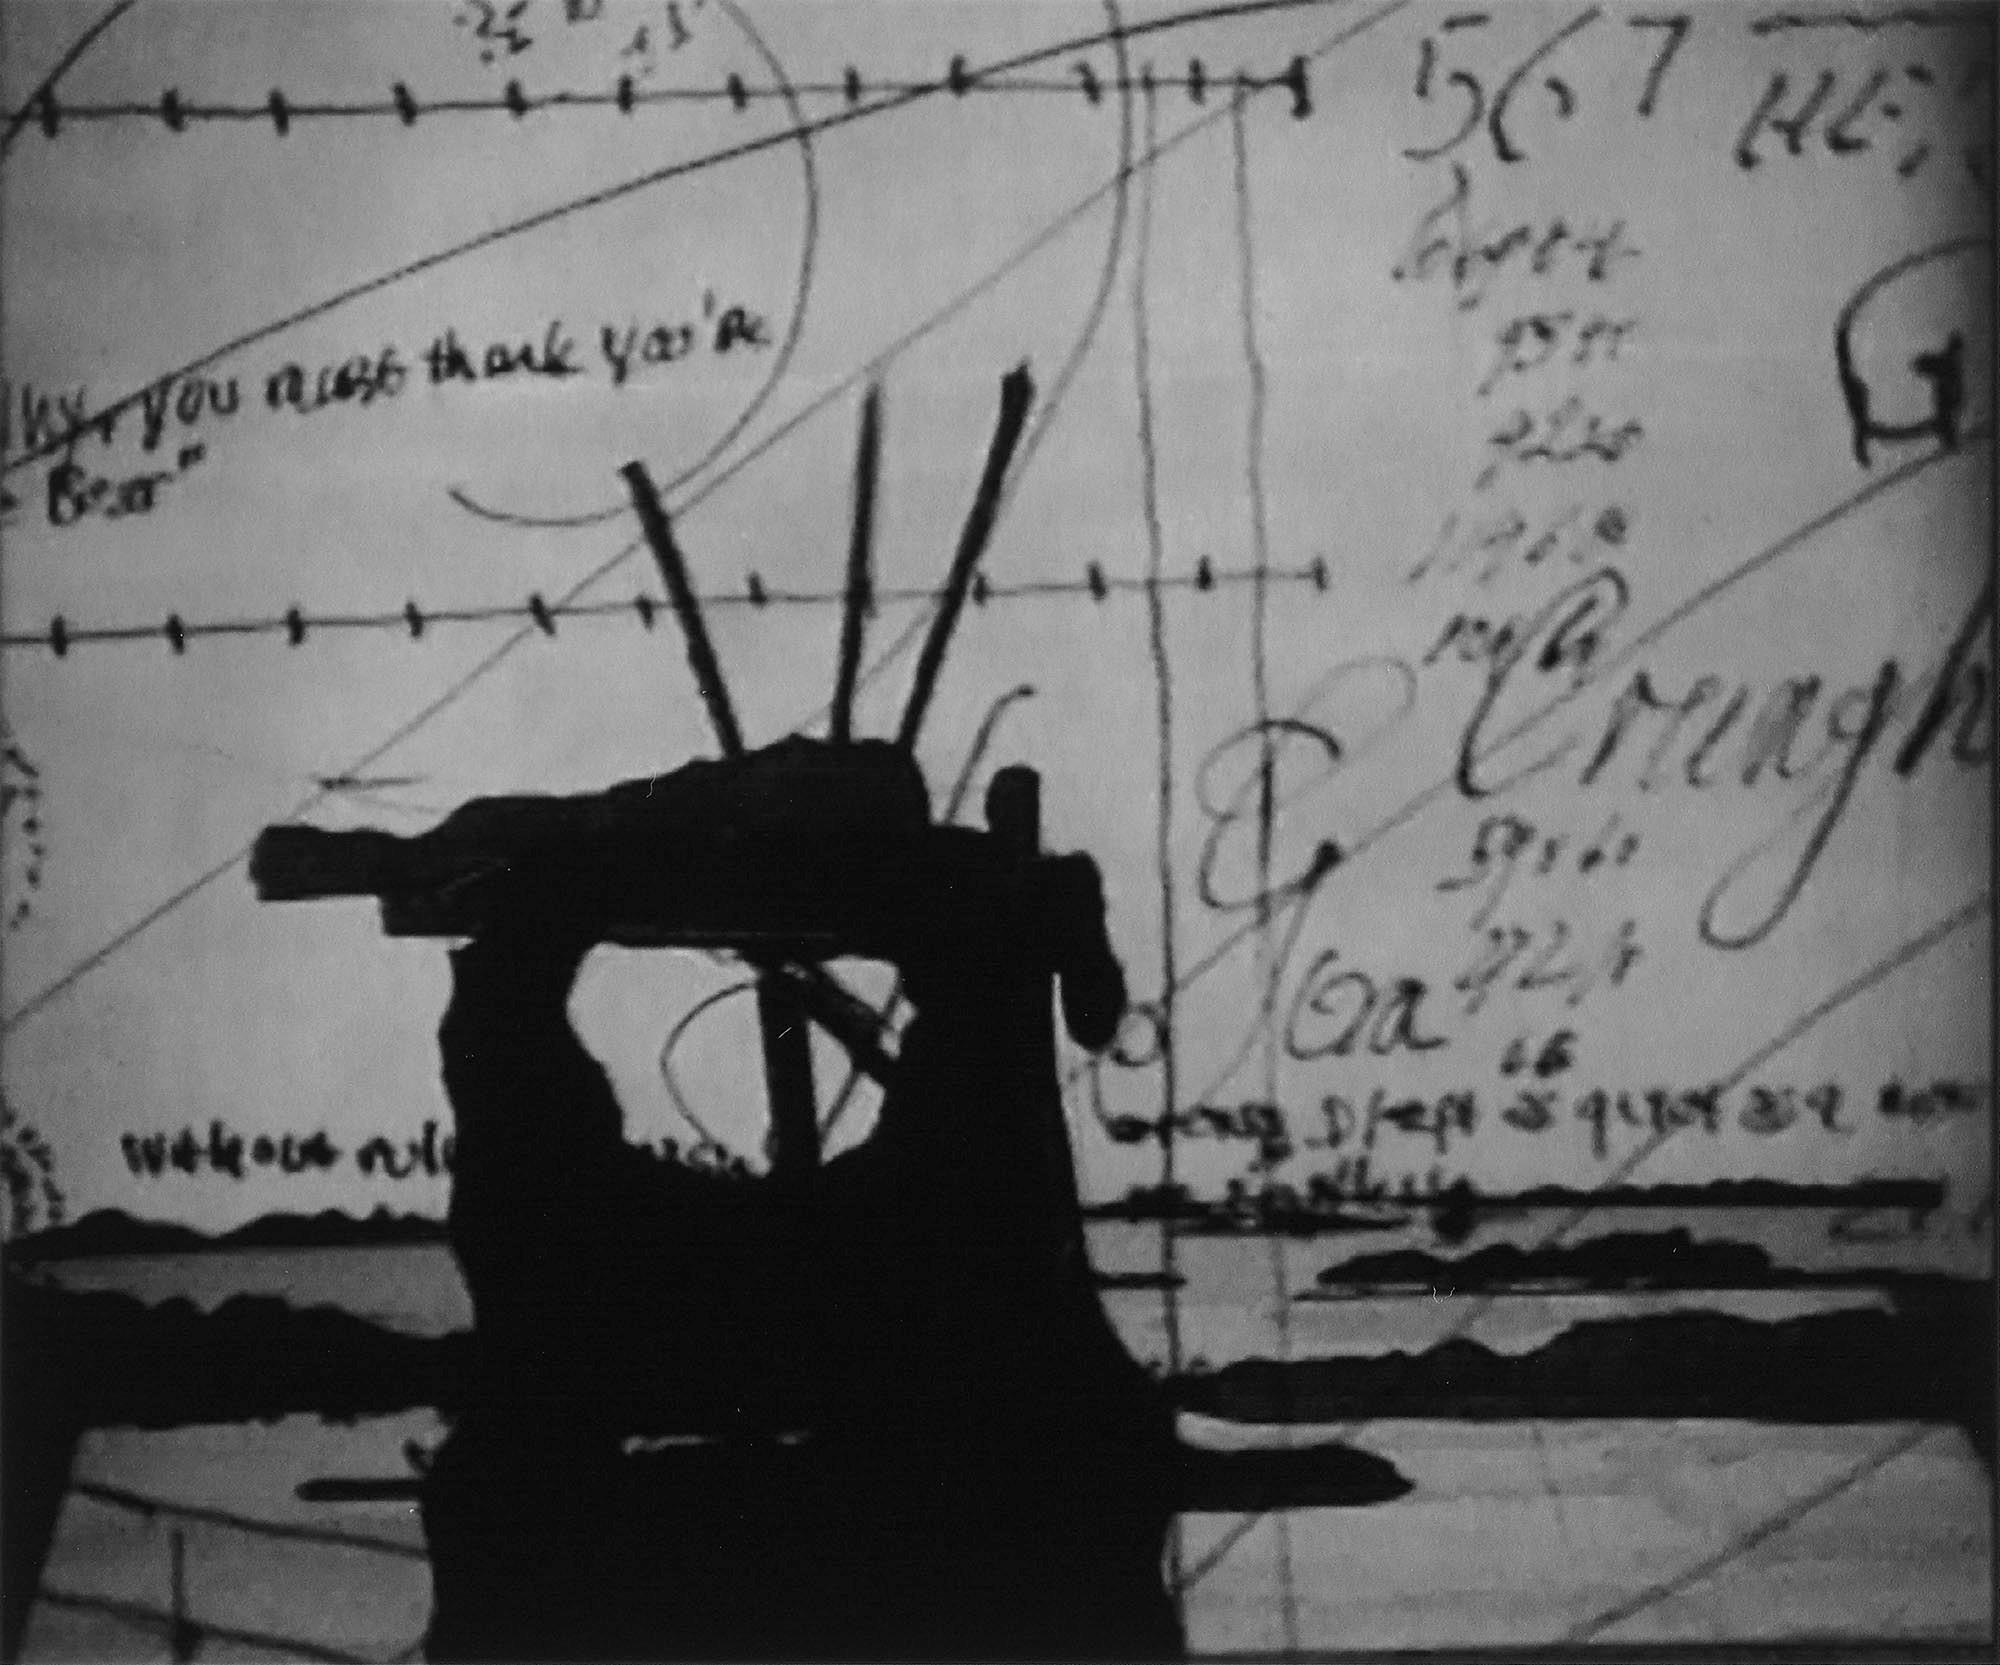 Kentrdige - Zeno Writing (3)